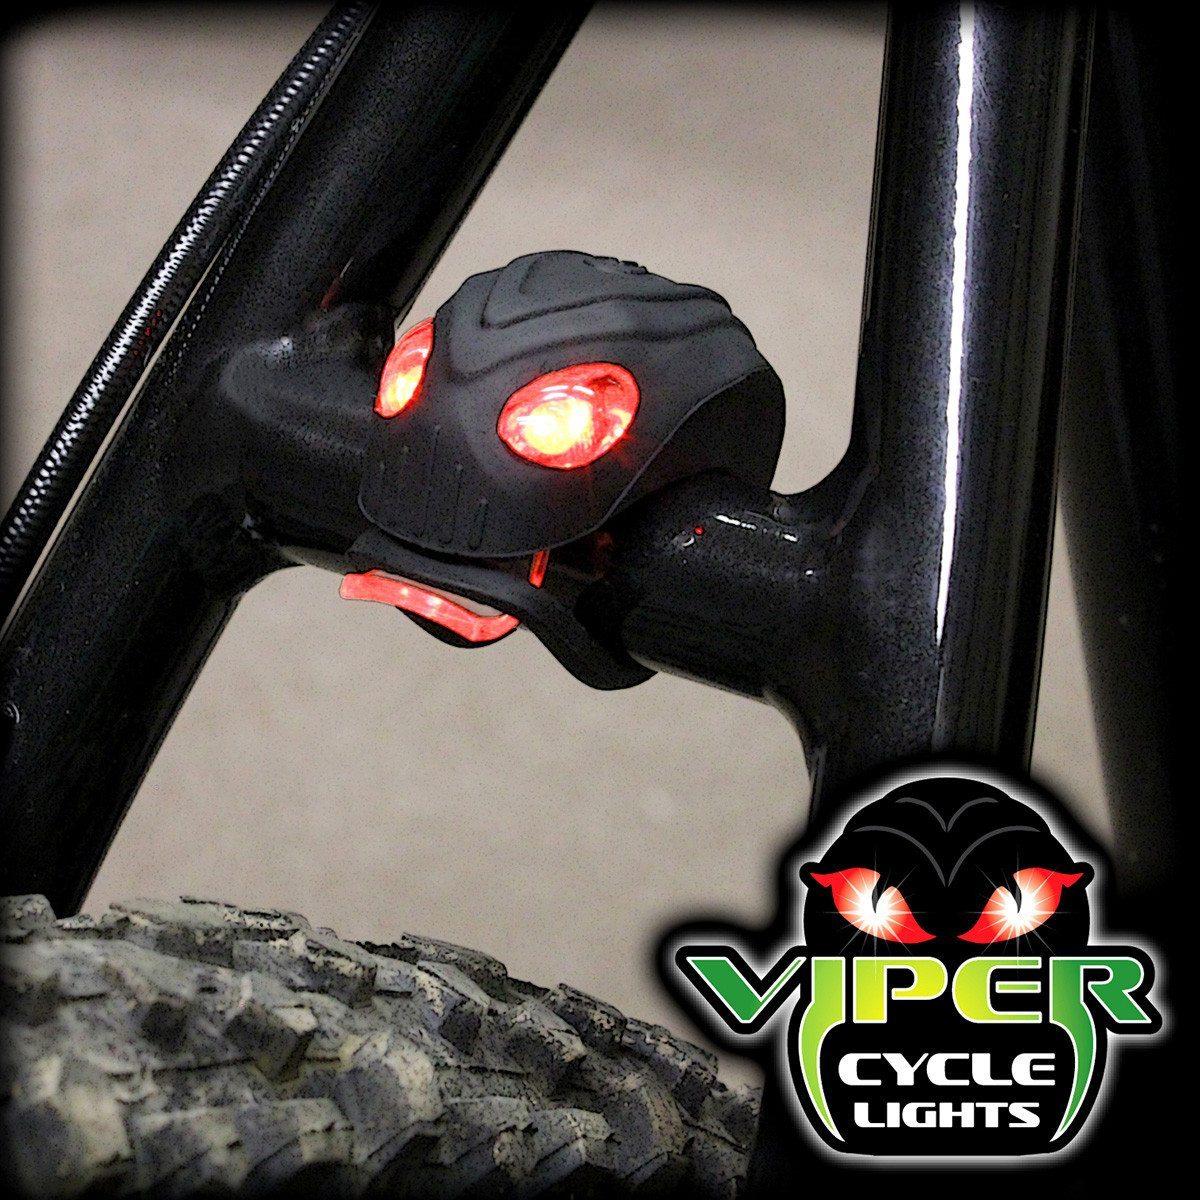 Luces LED para bicicletas Viper